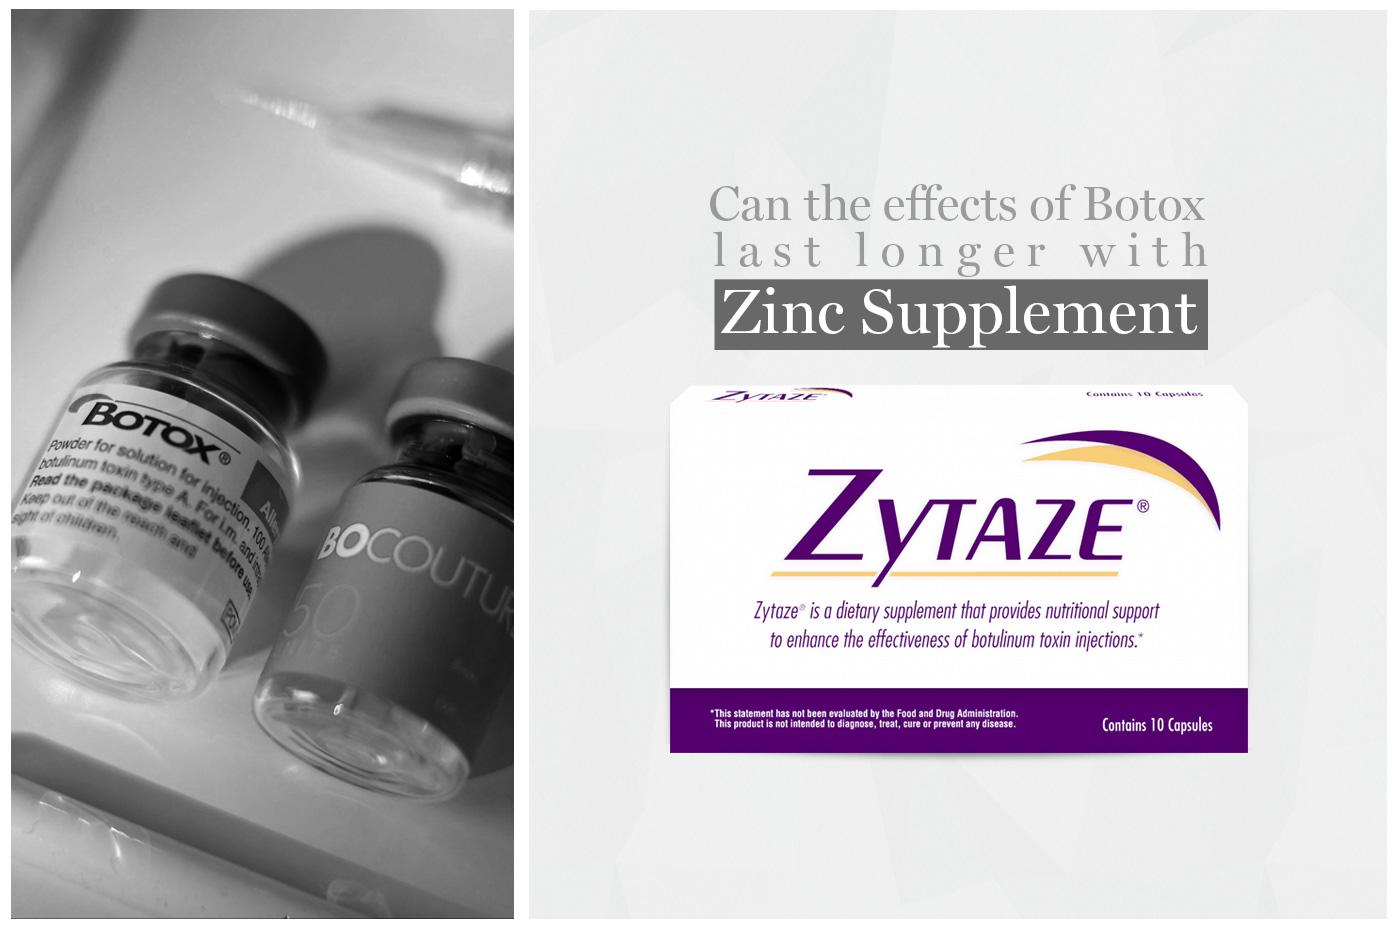 botox-with-zinc-supplement